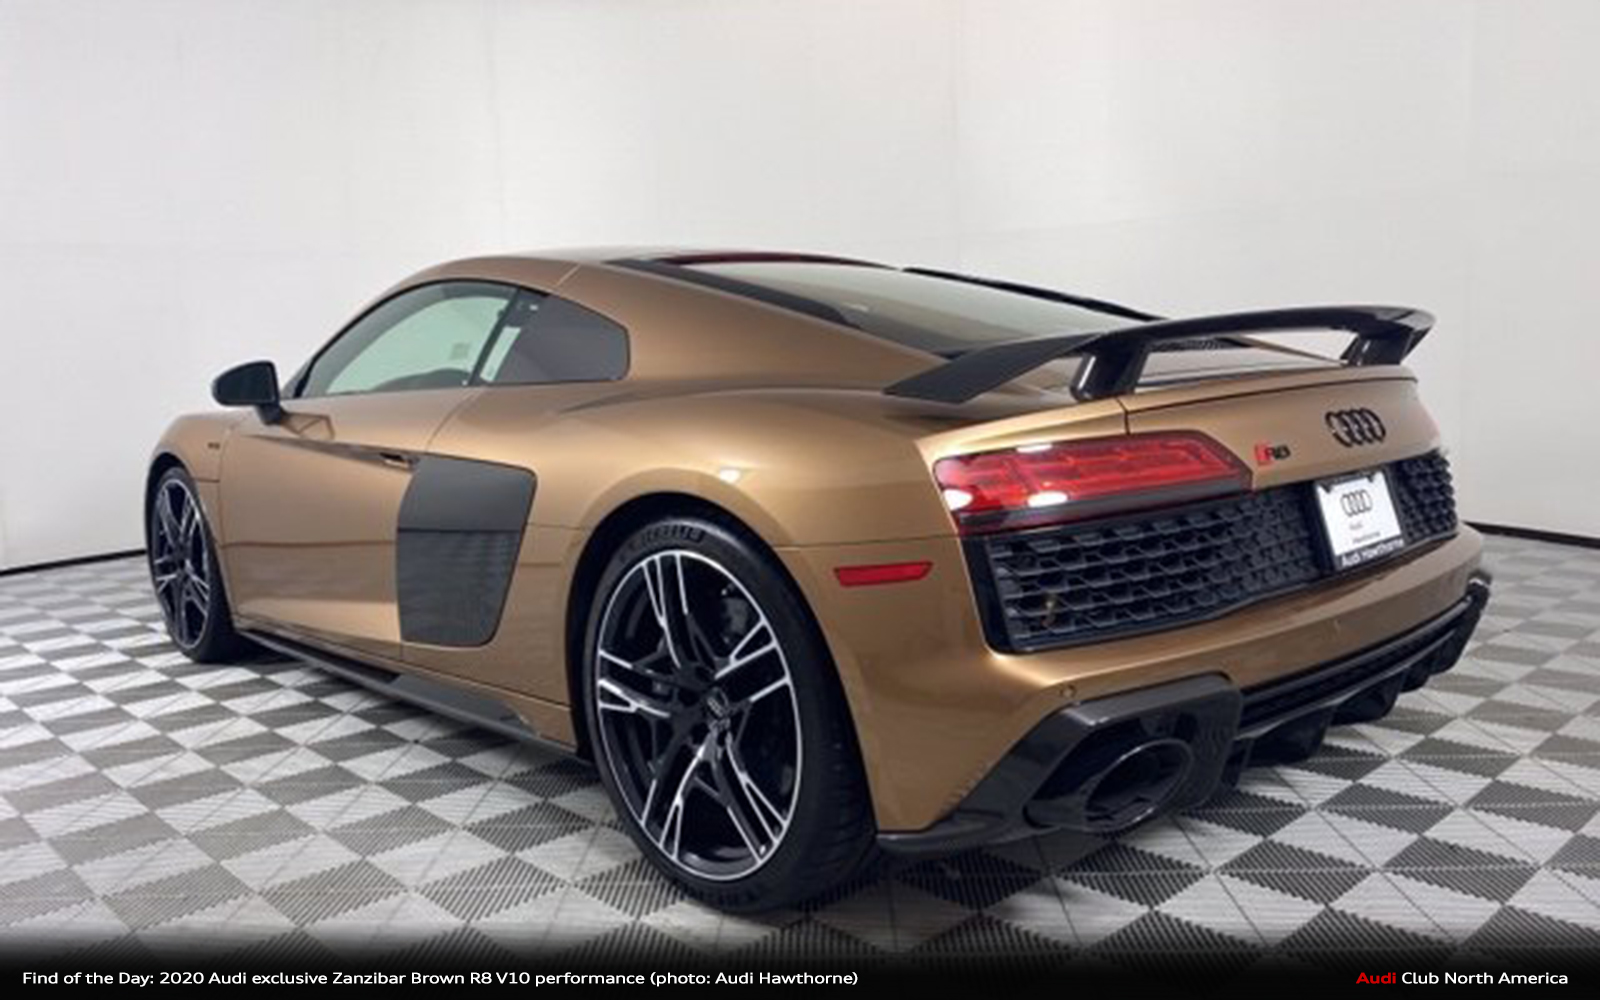 Find Of The Day 2020 Audi Exclusive Zanzibar Brown R8 V10 Performance Audi Club North America